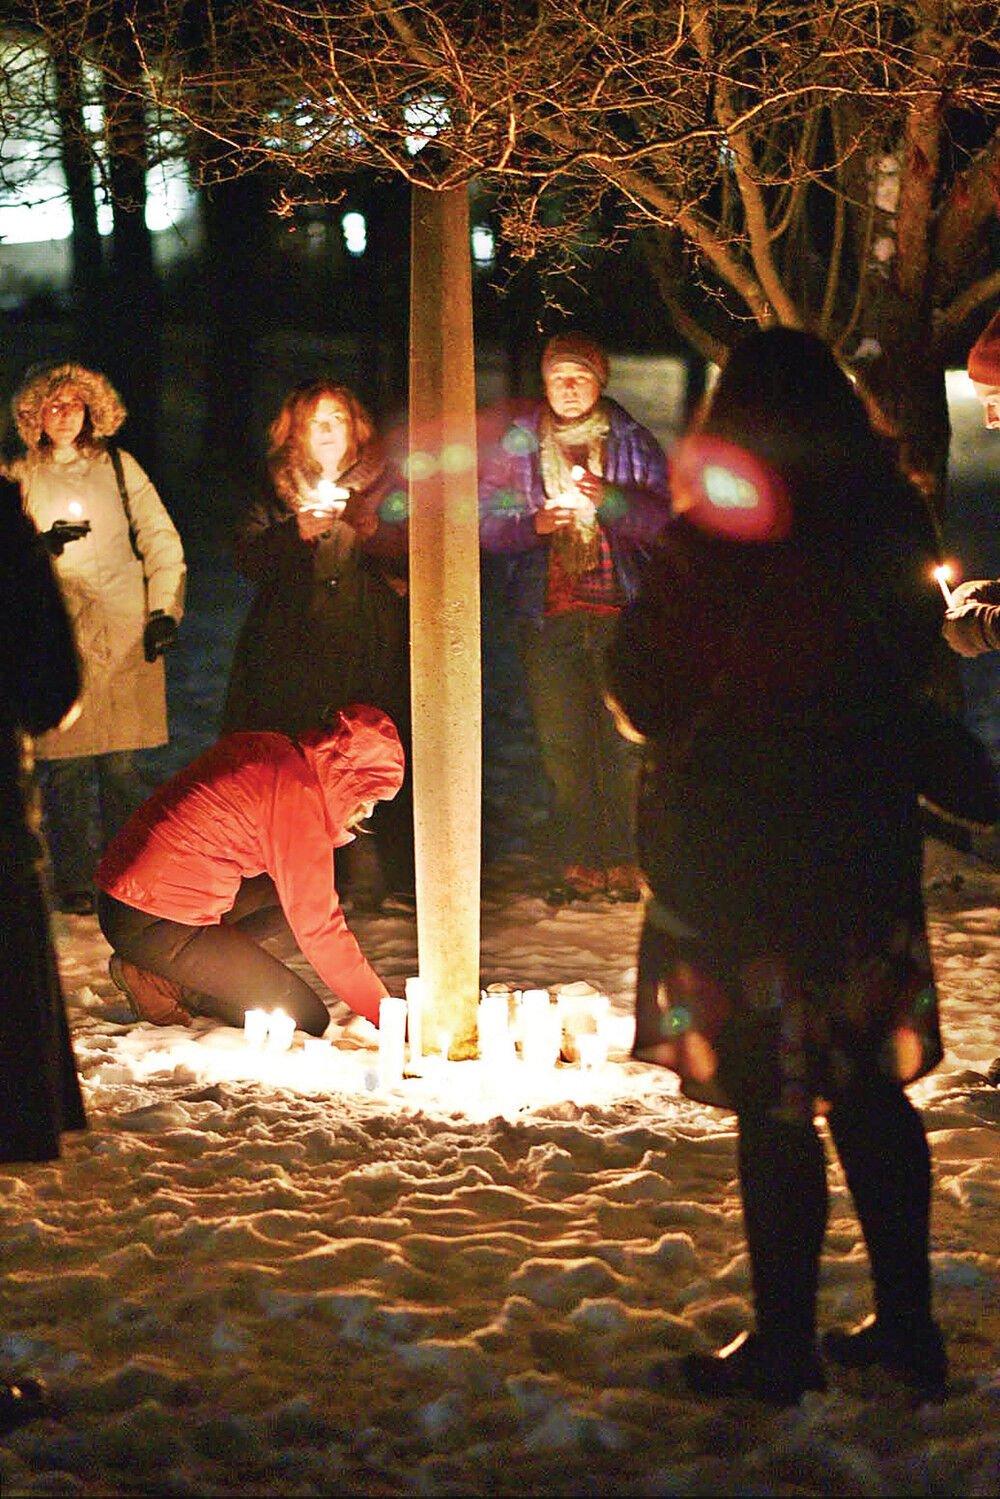 Sense of loss endures 25 years after shootings at Simon's Rock